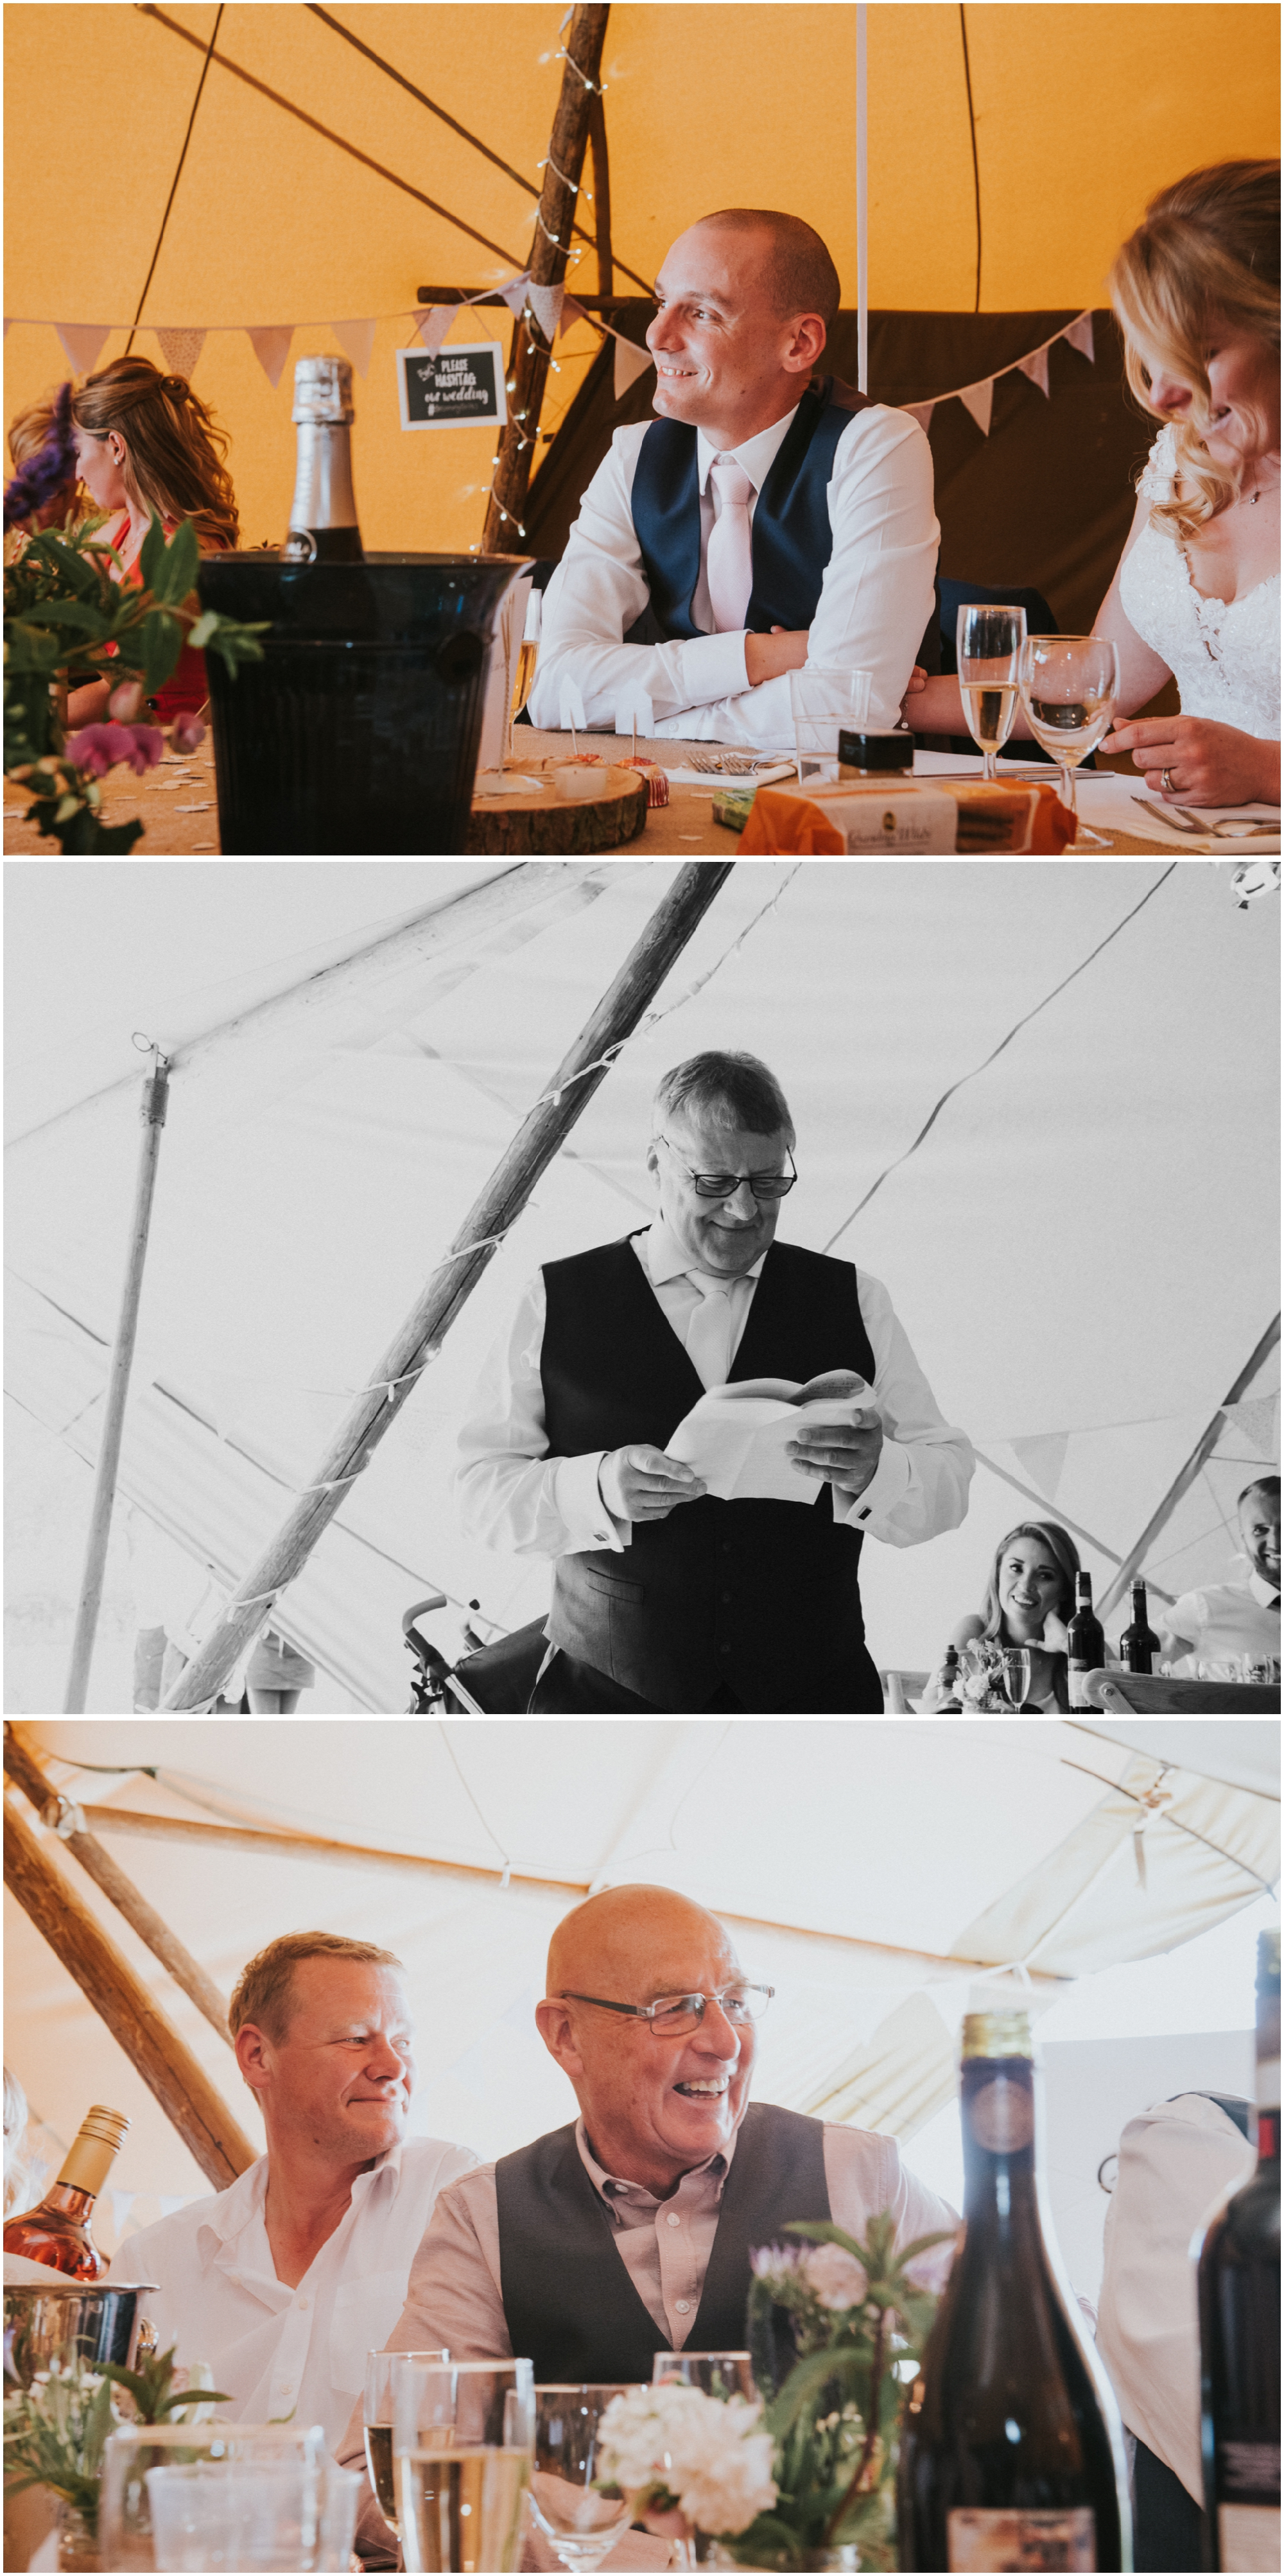 SkipbridegFarmWedding-LukeHolroyd-Yorkshirewedding_0106.jpg